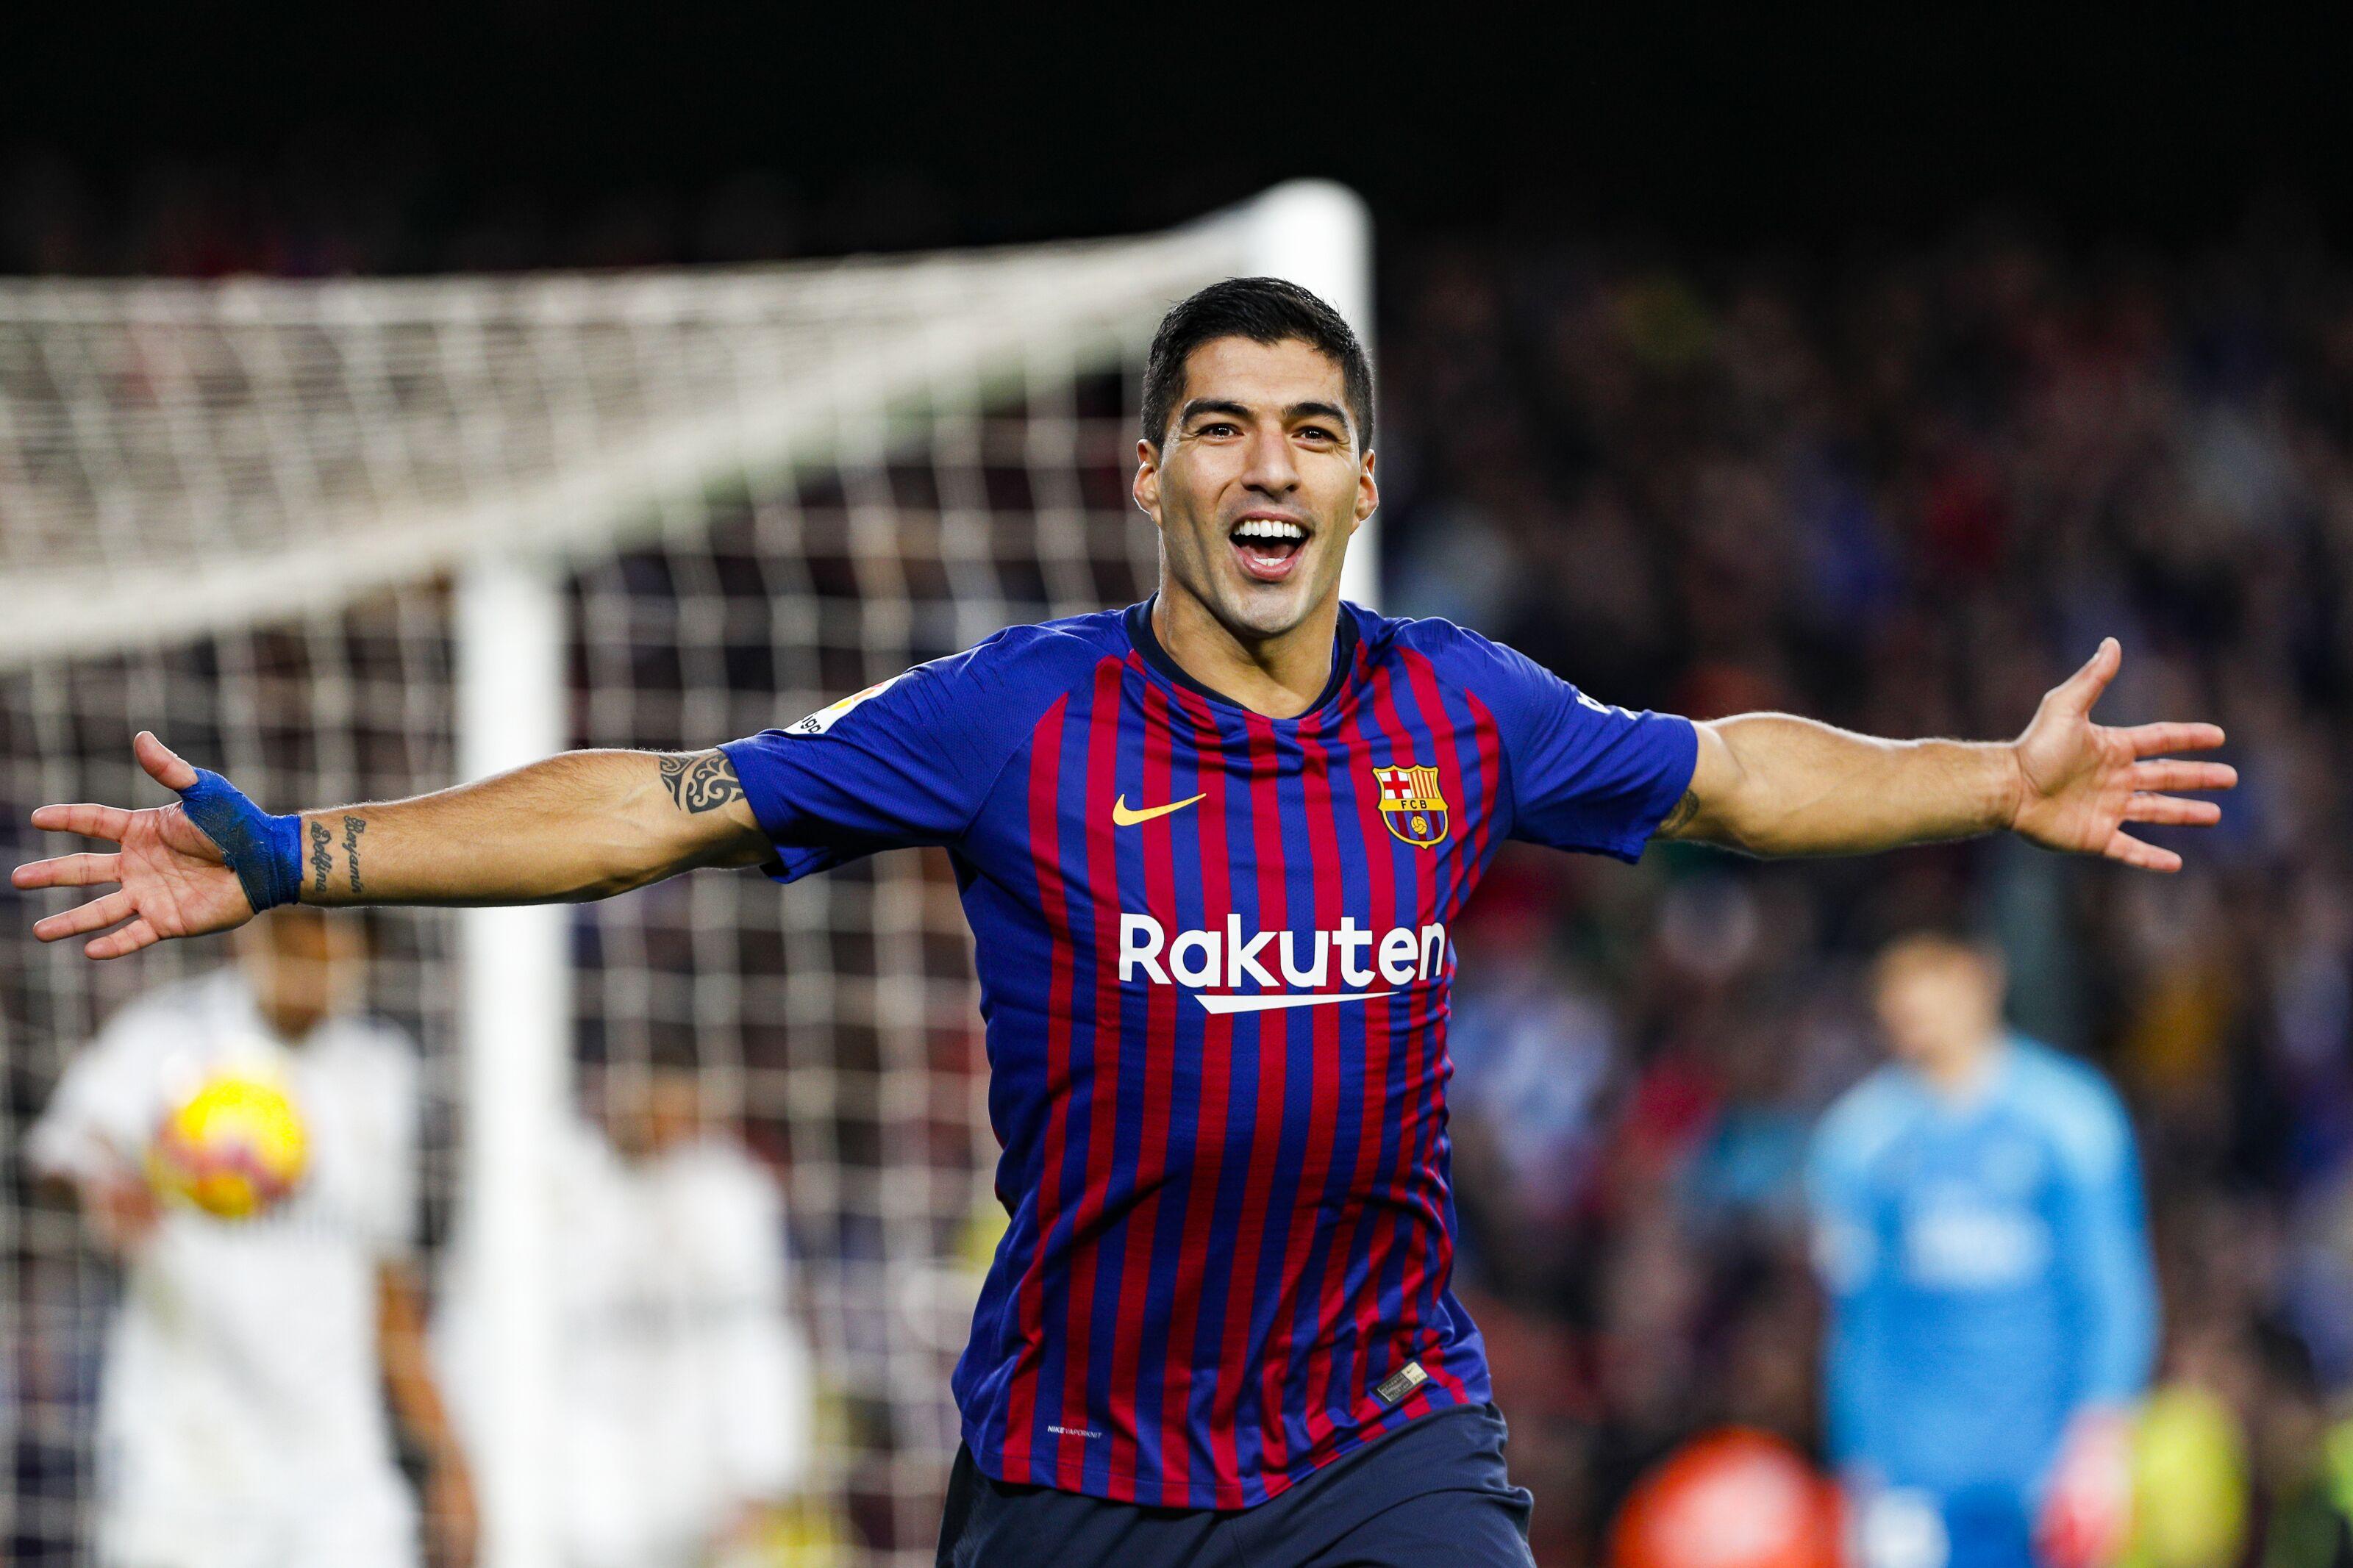 fc39c4575f4 Barcelona vs. Valladolid live stream  Watch La Liga online